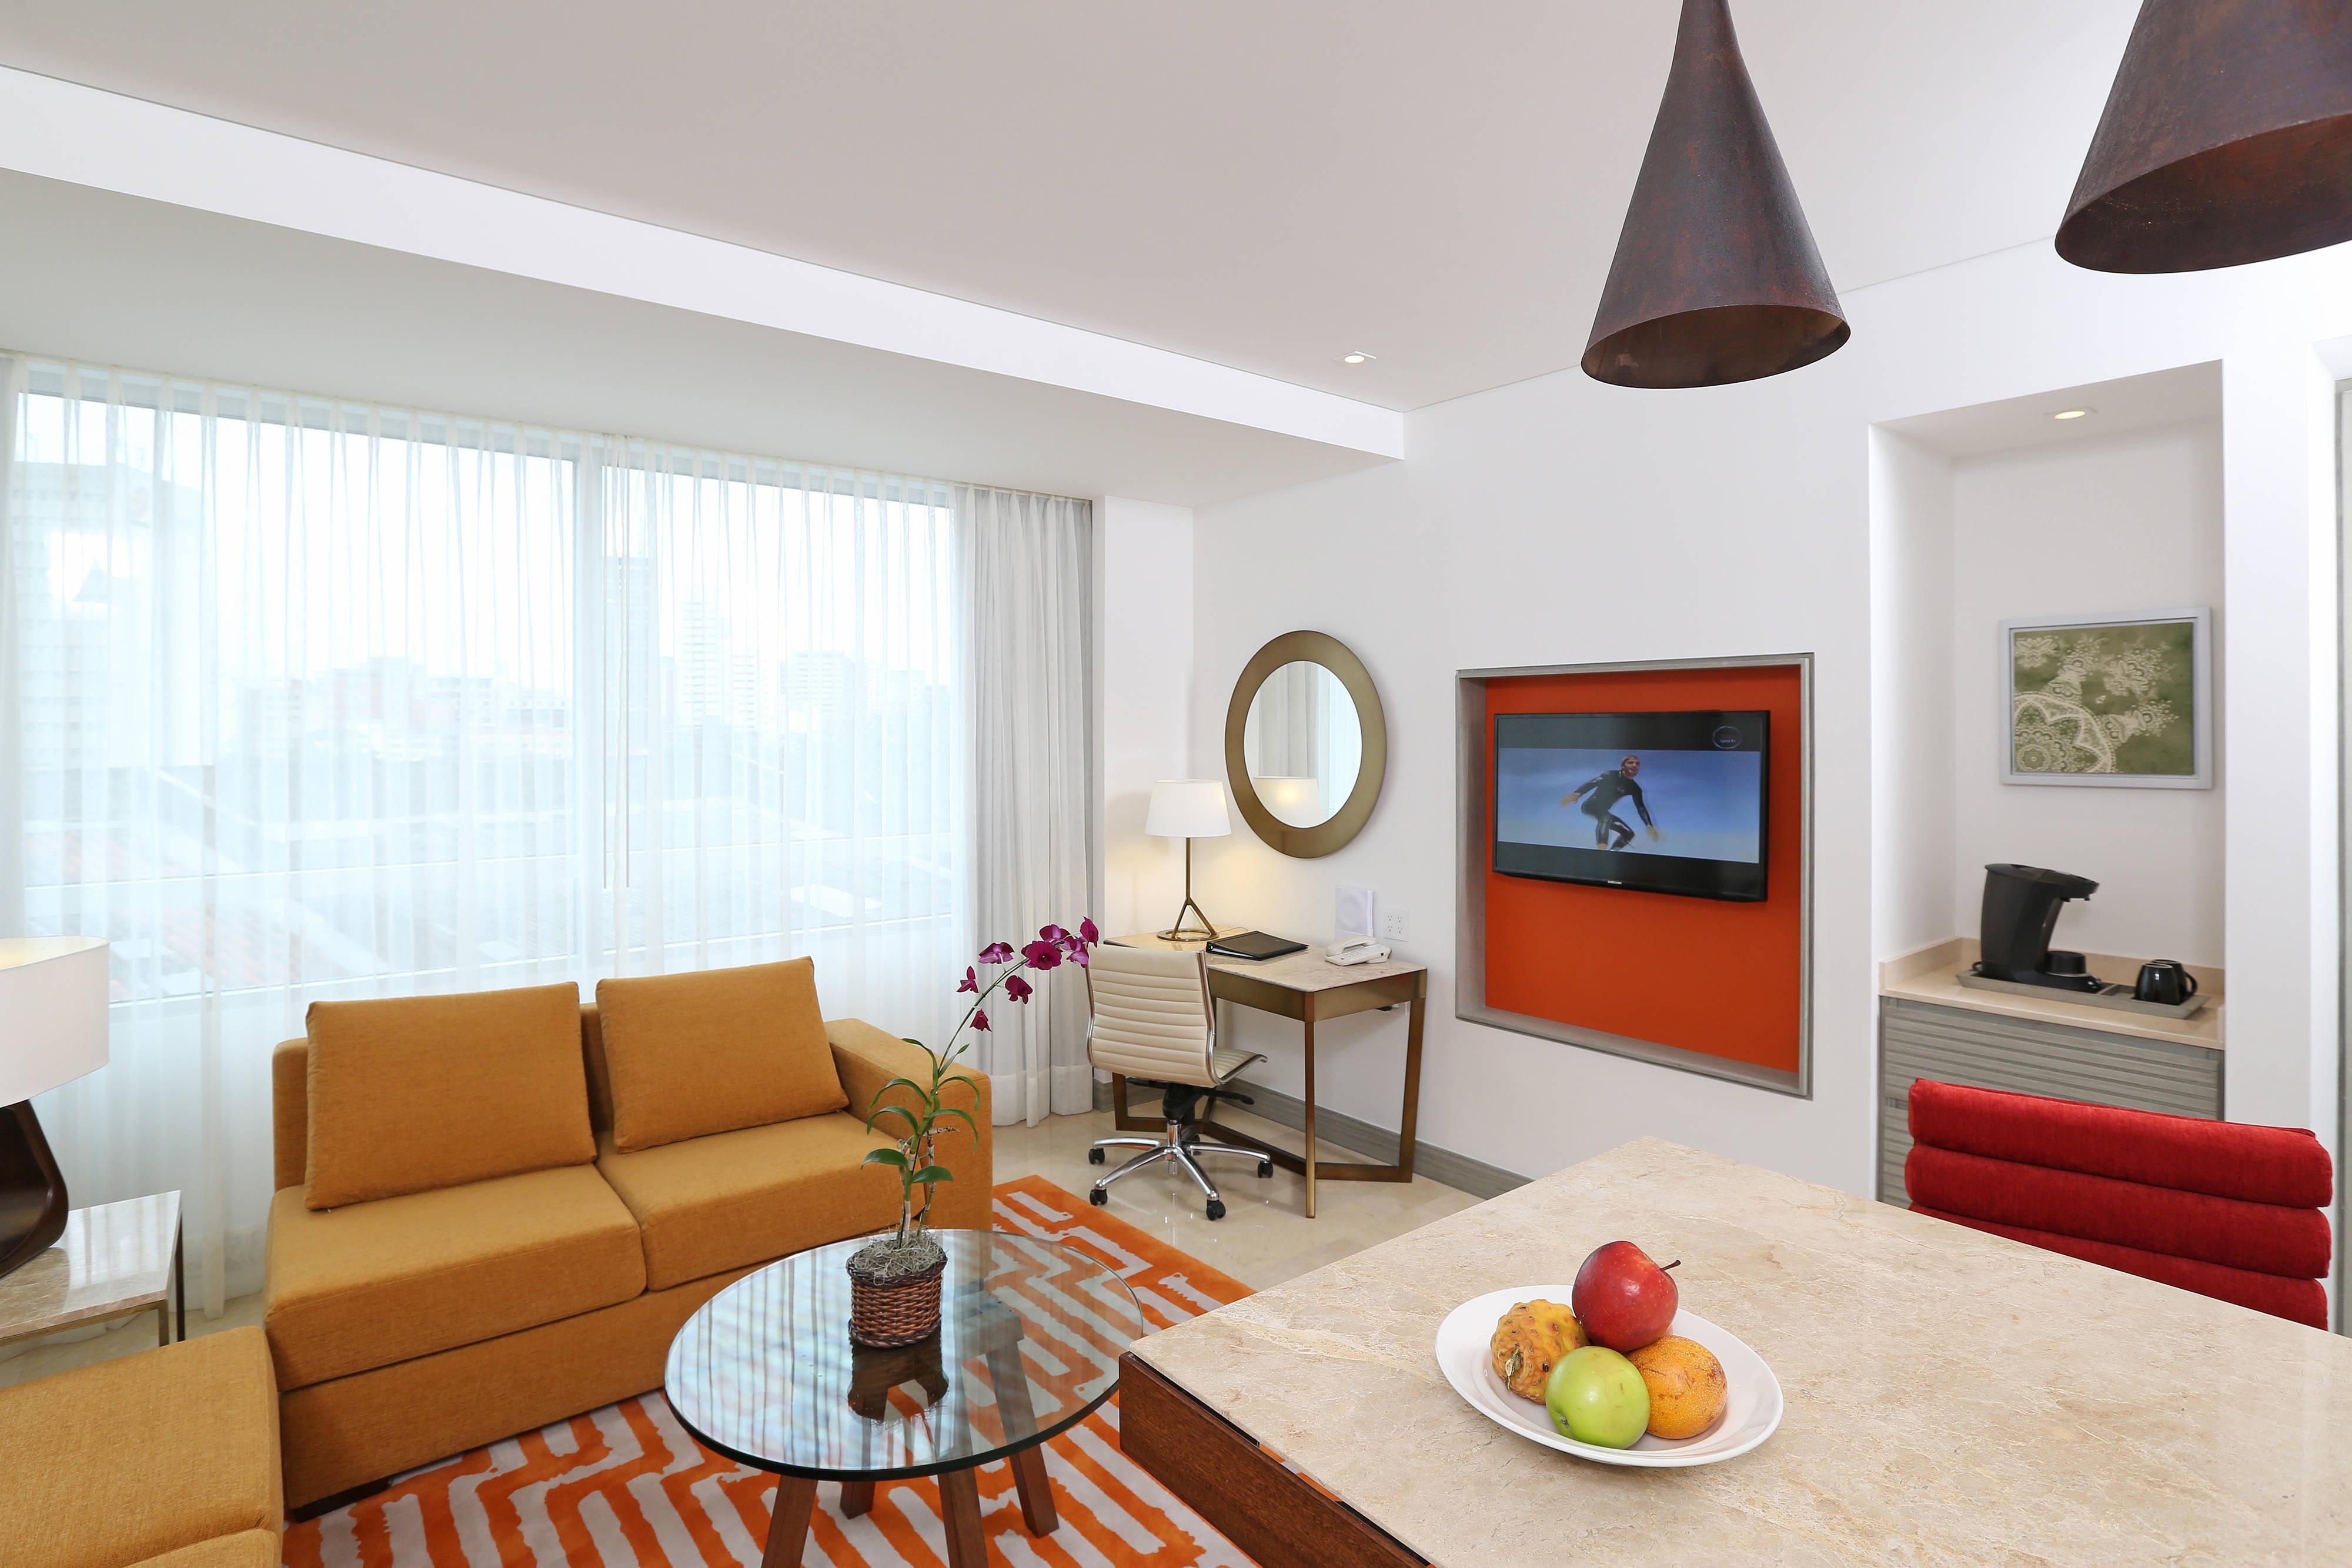 Marriott Cali hotel rooms